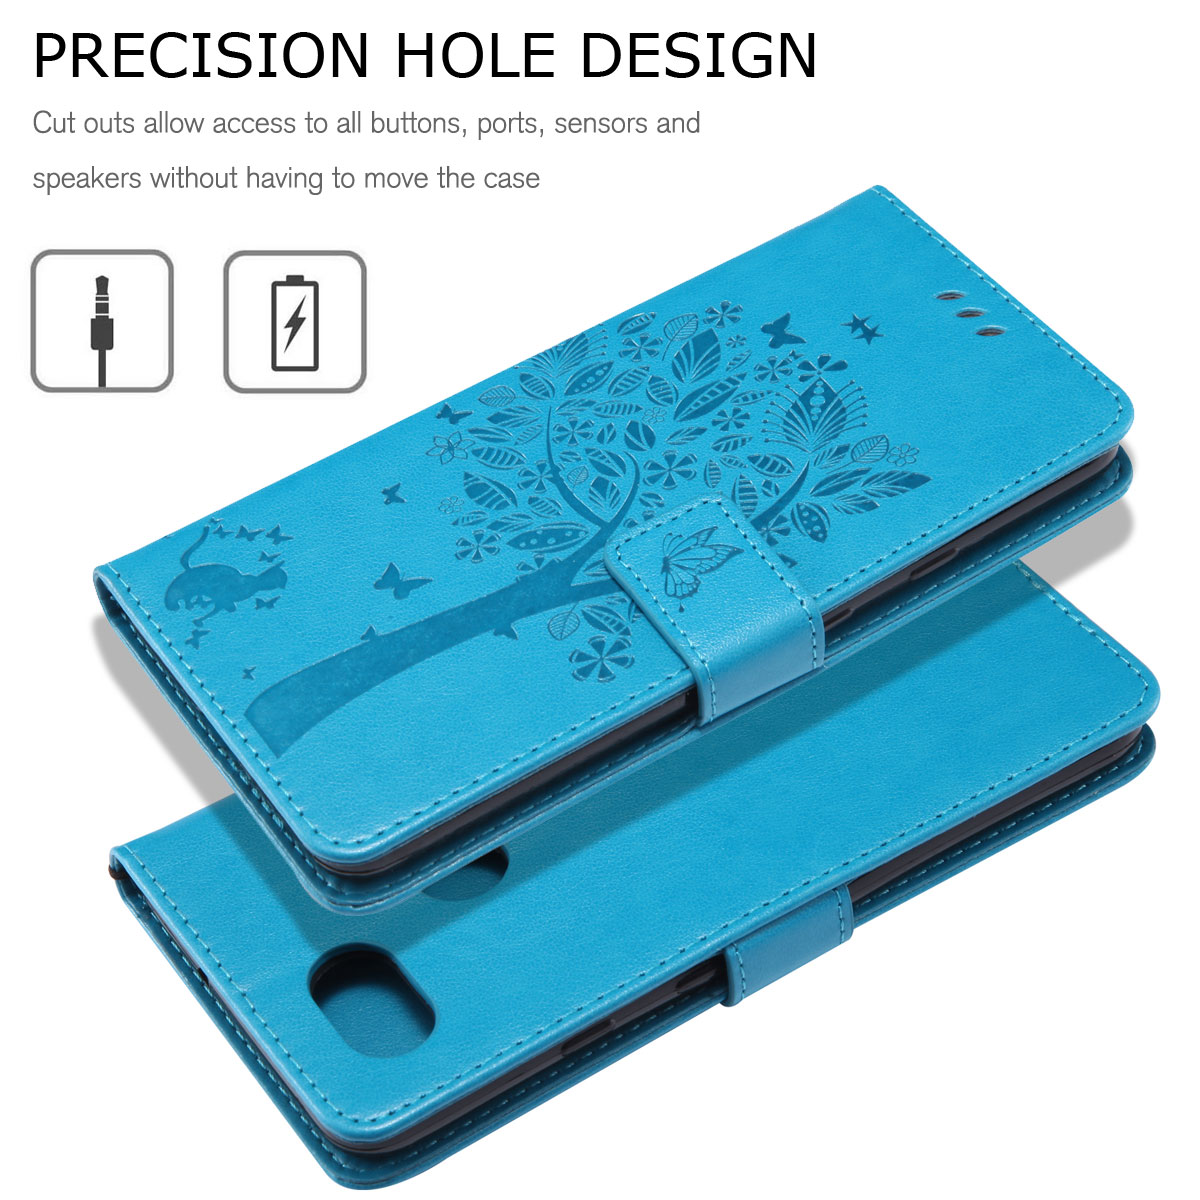 Magnetic-Leather-Credit-Card-Holder-Flip-Case-Cover-For-Google-Pixel-2-2-XL thumbnail 24